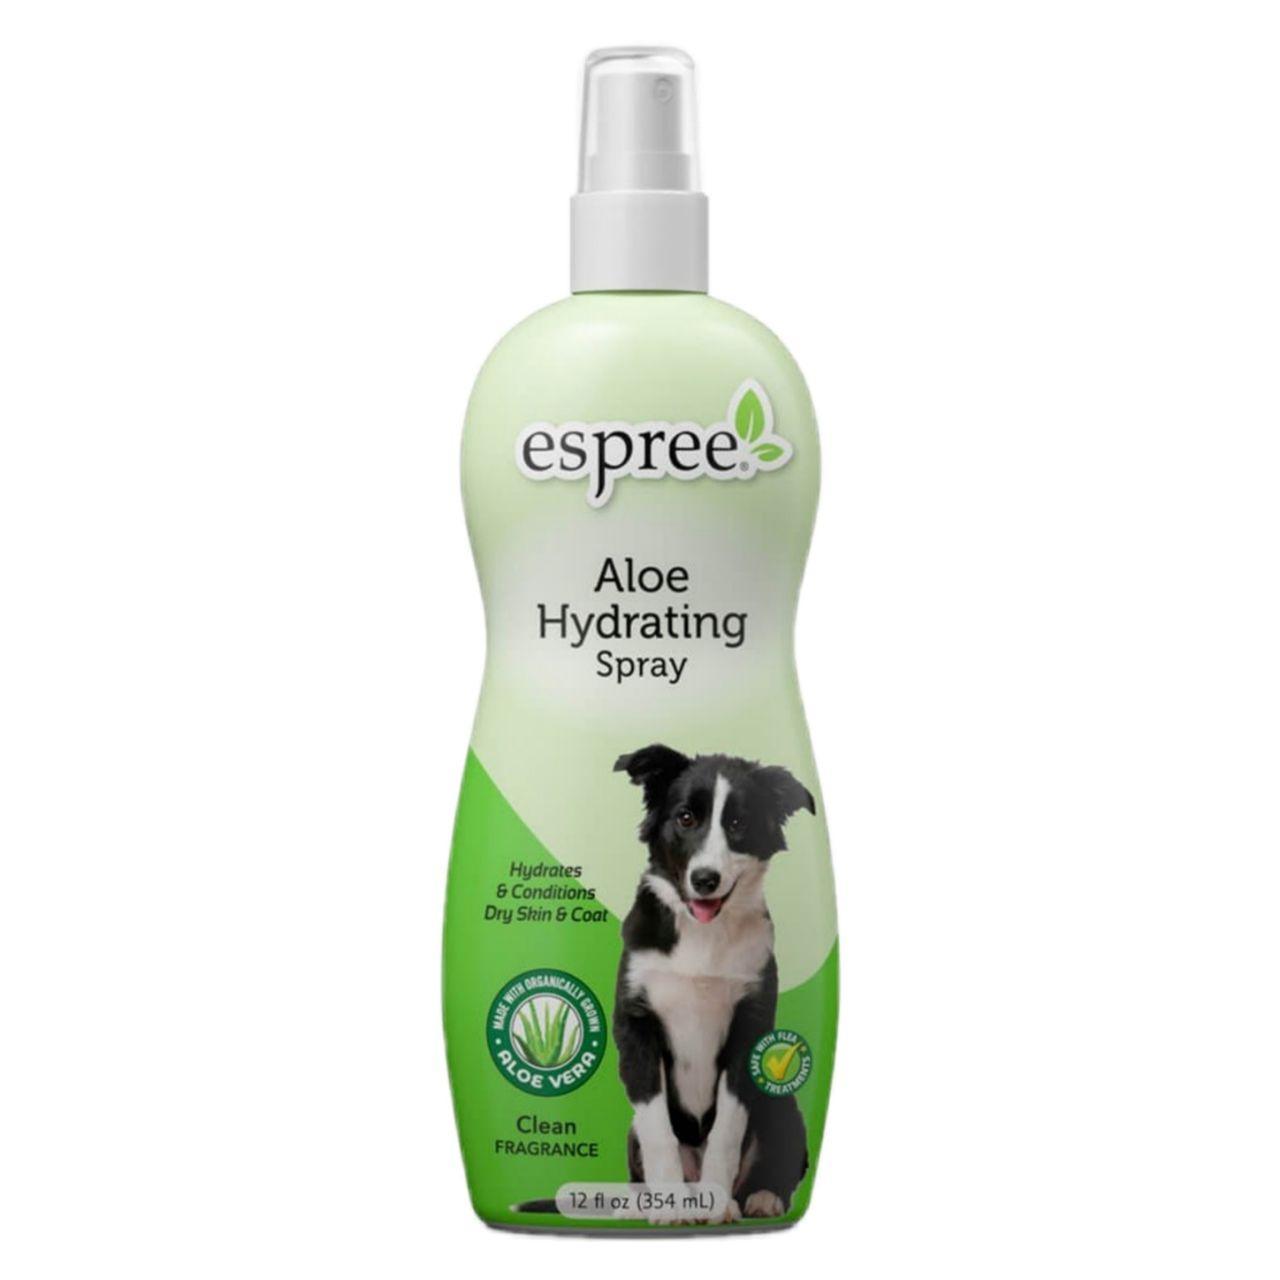 Espree Aloe Hydrating Spray –  суперувлажняющий спрей для кожи и шерсти собак